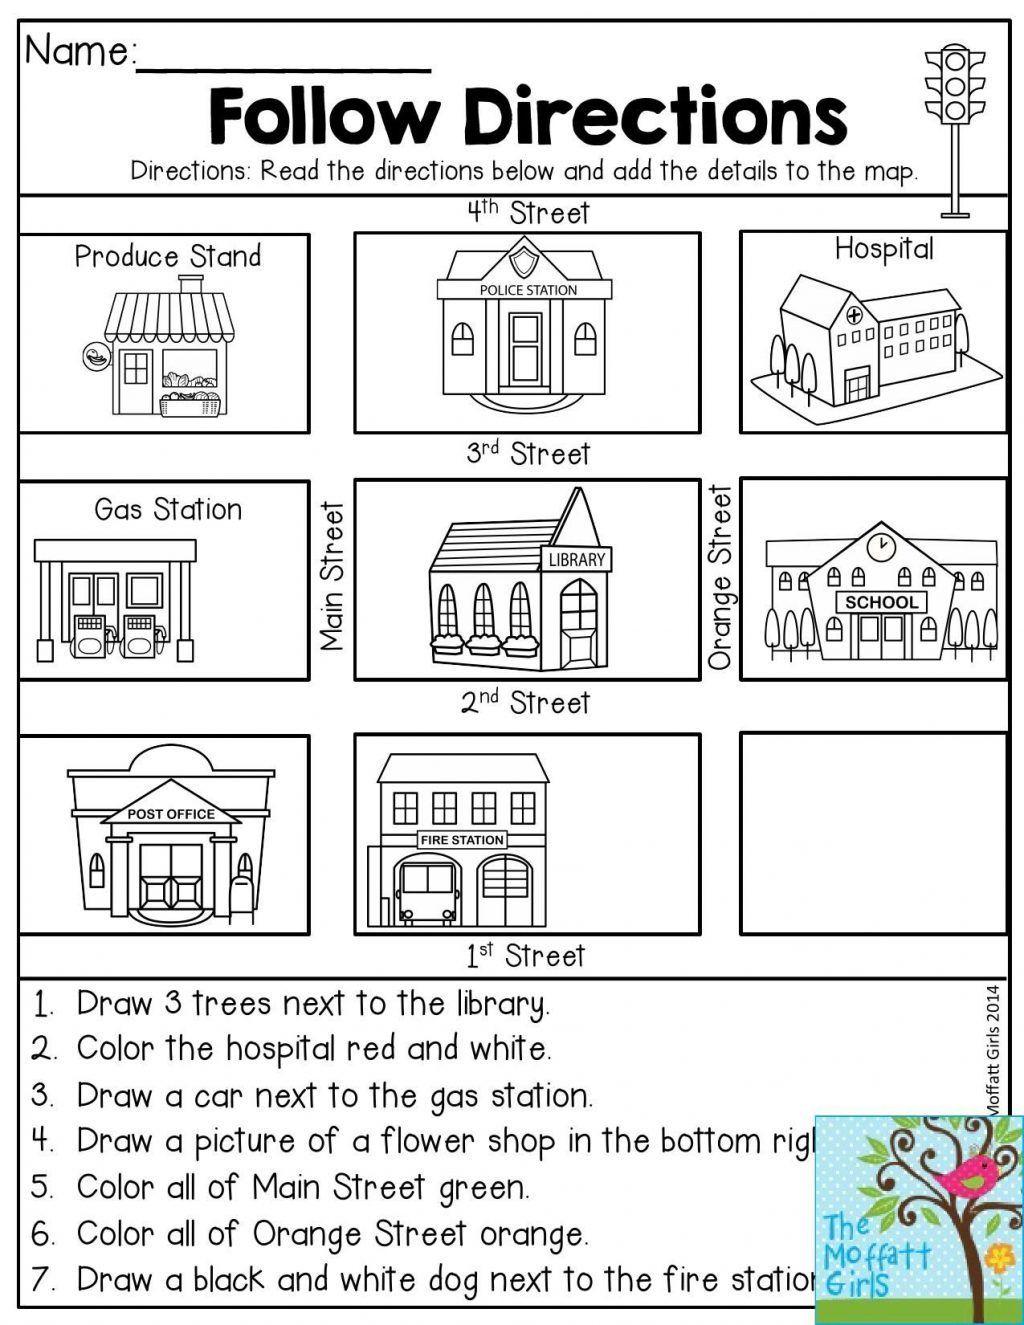 free map skills worksheets math worksheets free printable following directions 5th grade april. Black Bedroom Furniture Sets. Home Design Ideas